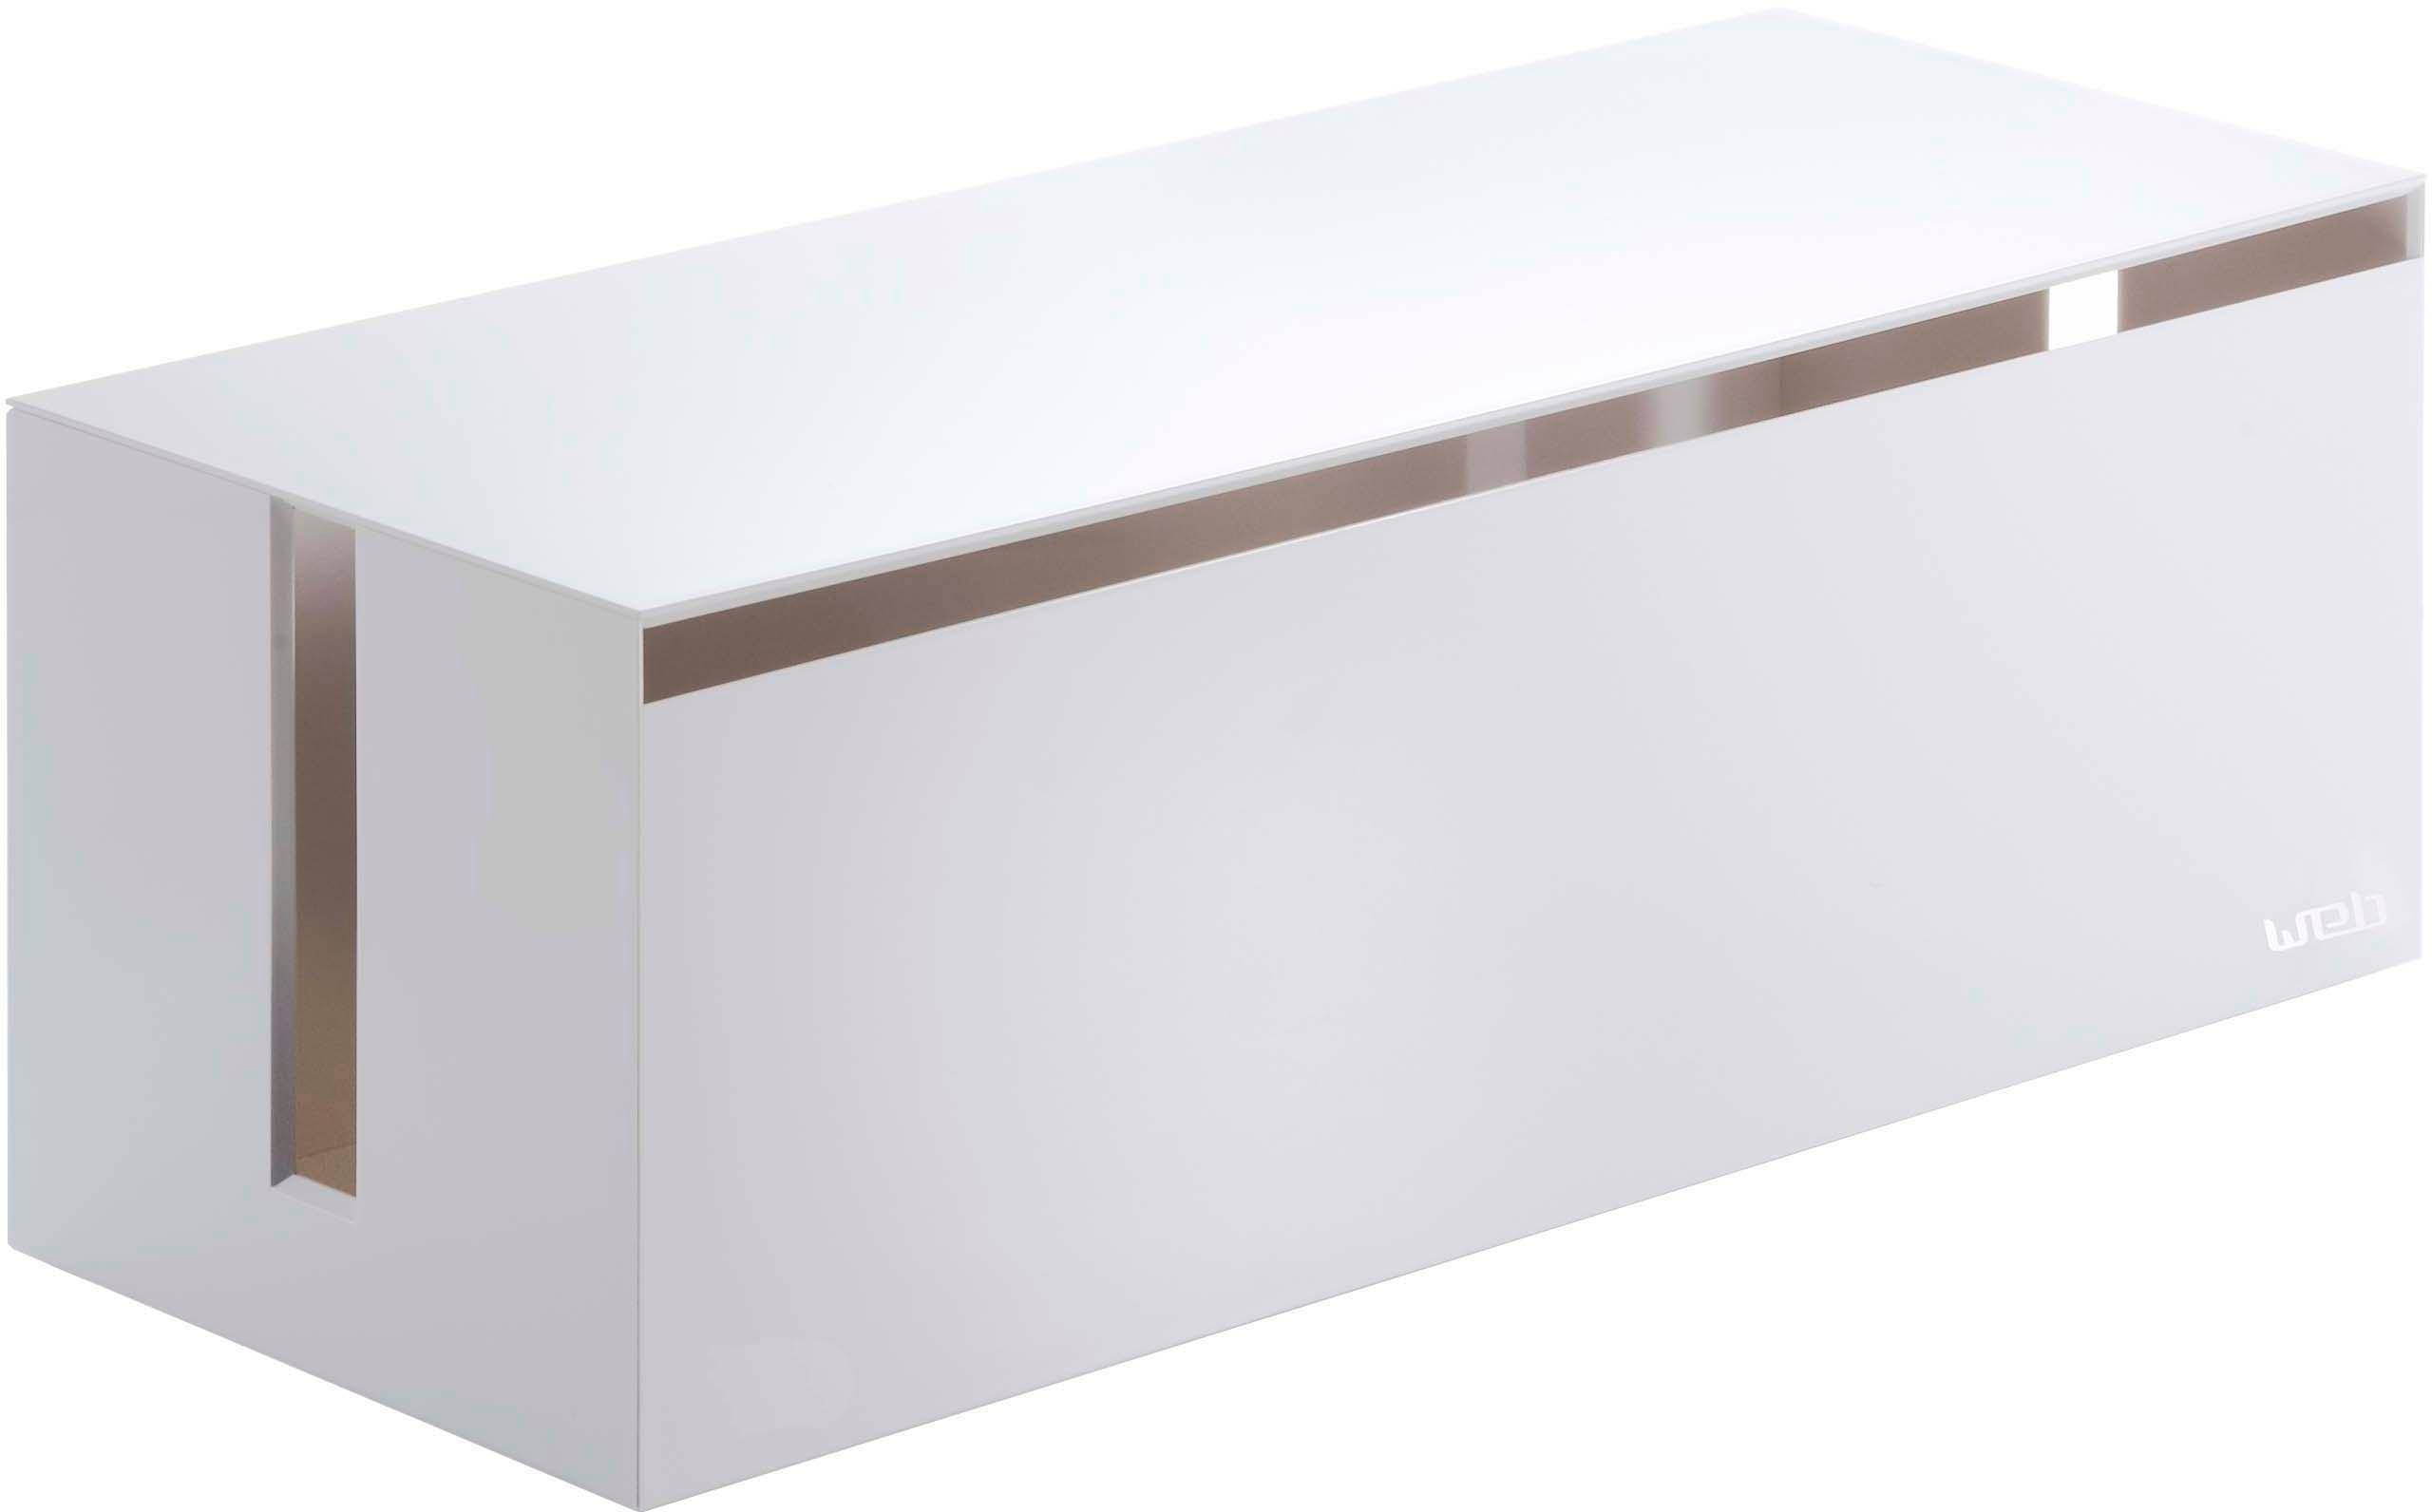 Scatola per cavi Web, Materiale sintetico (policarbonato), poliresina, Bianco, Larg. 40 x Alt. 15 cm